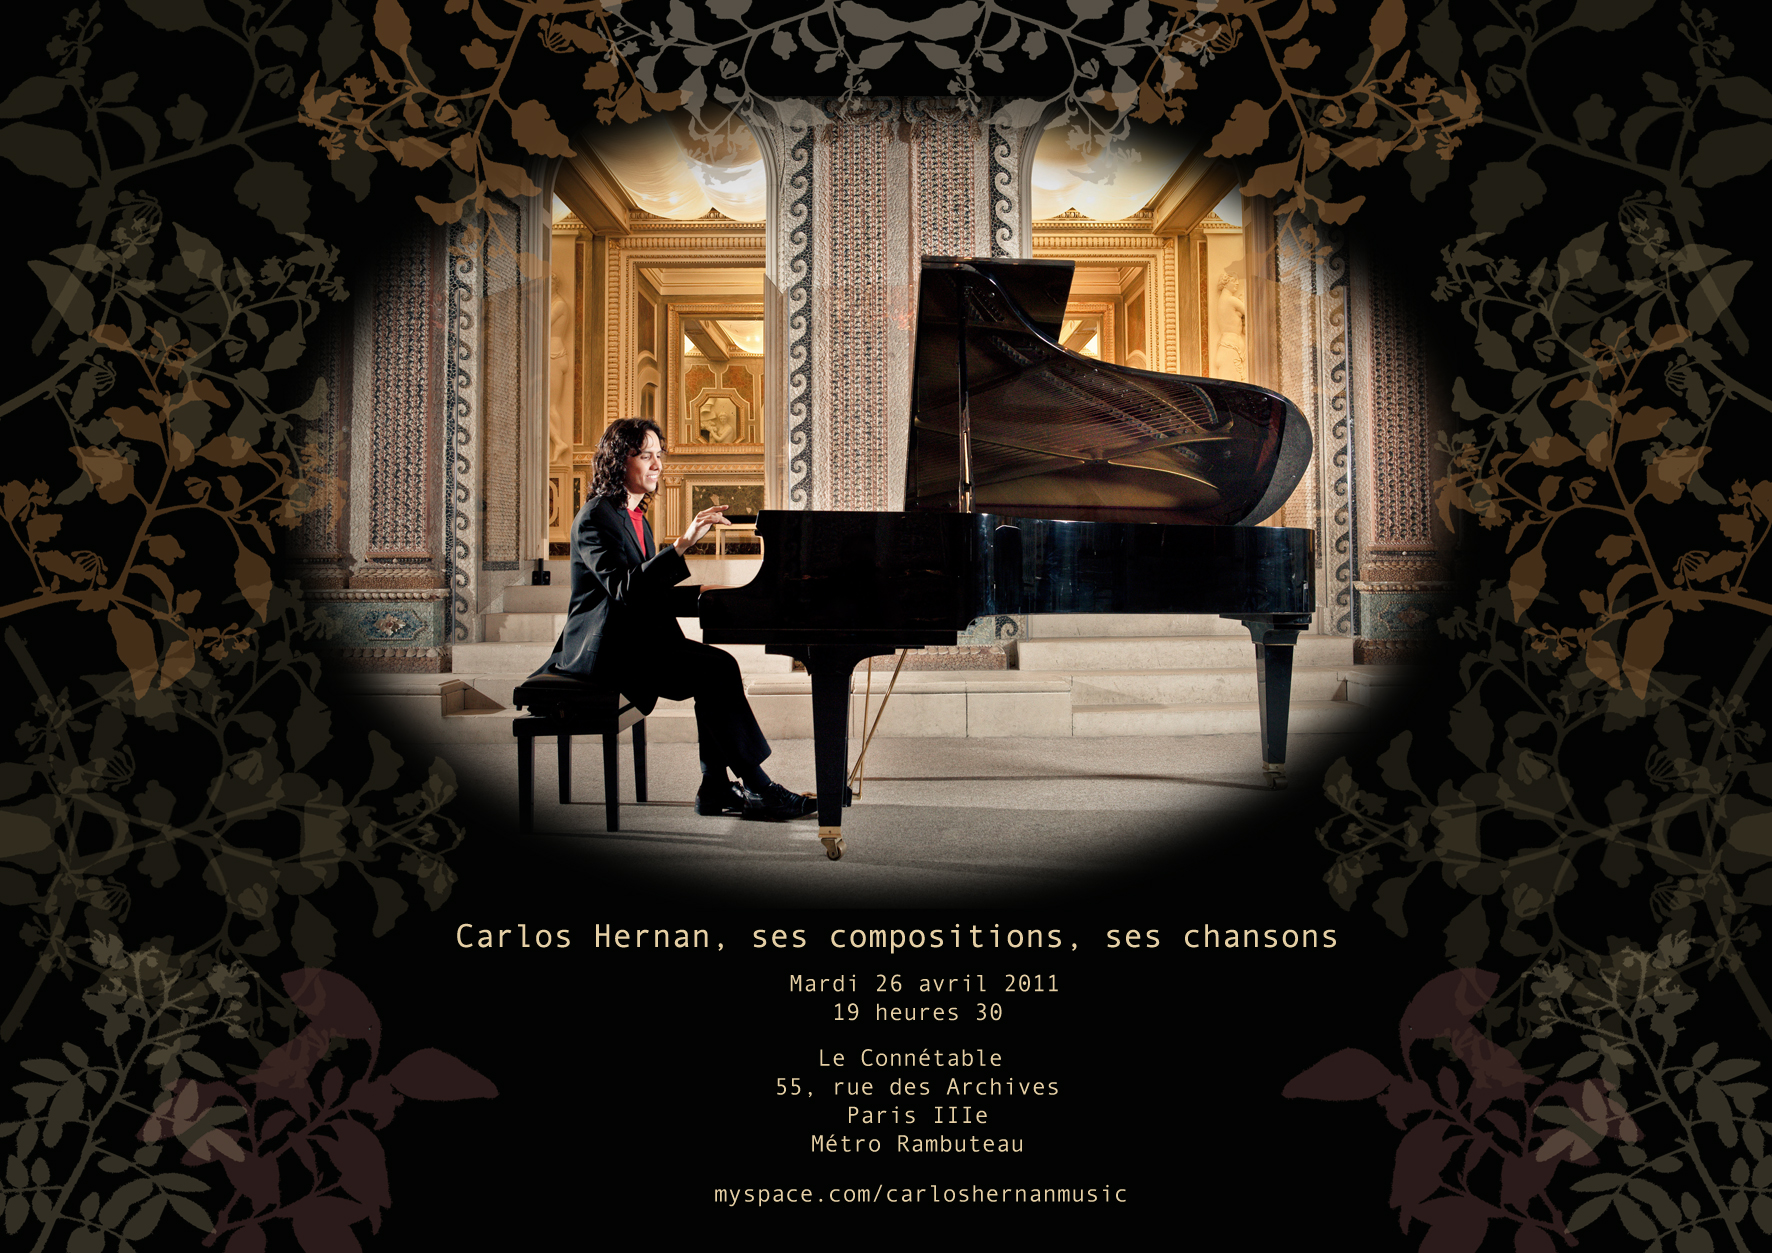 ...ses compositions, ses chansons